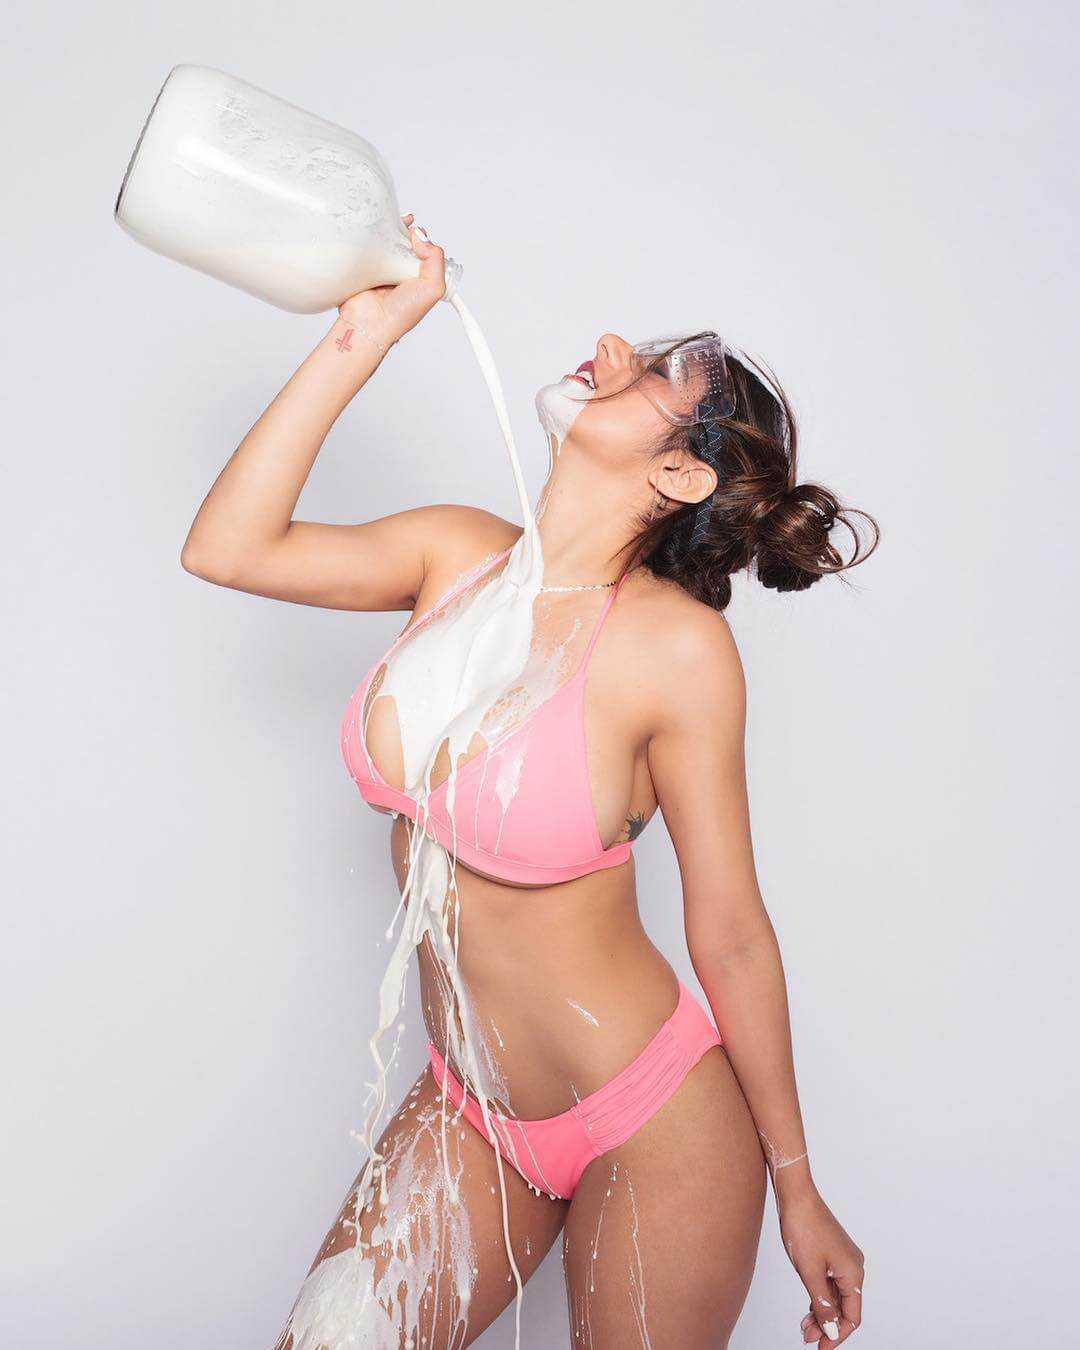 Mia Khalifa sexy look pic